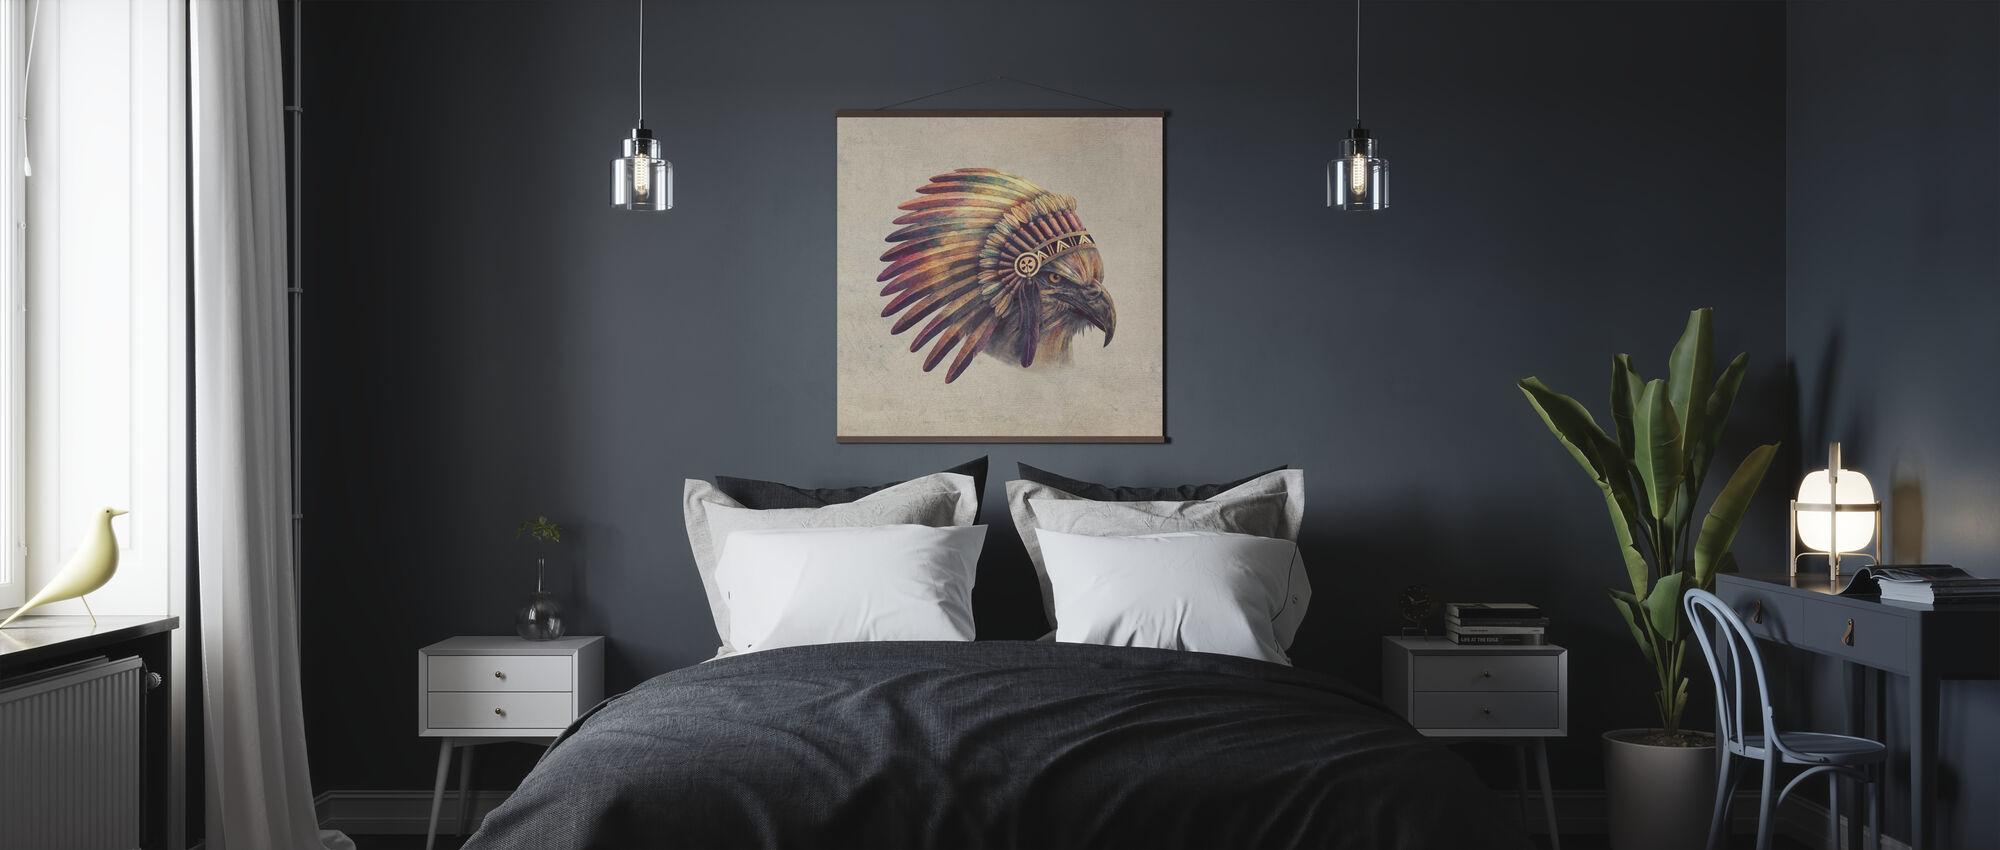 Chief - Poster - Bedroom